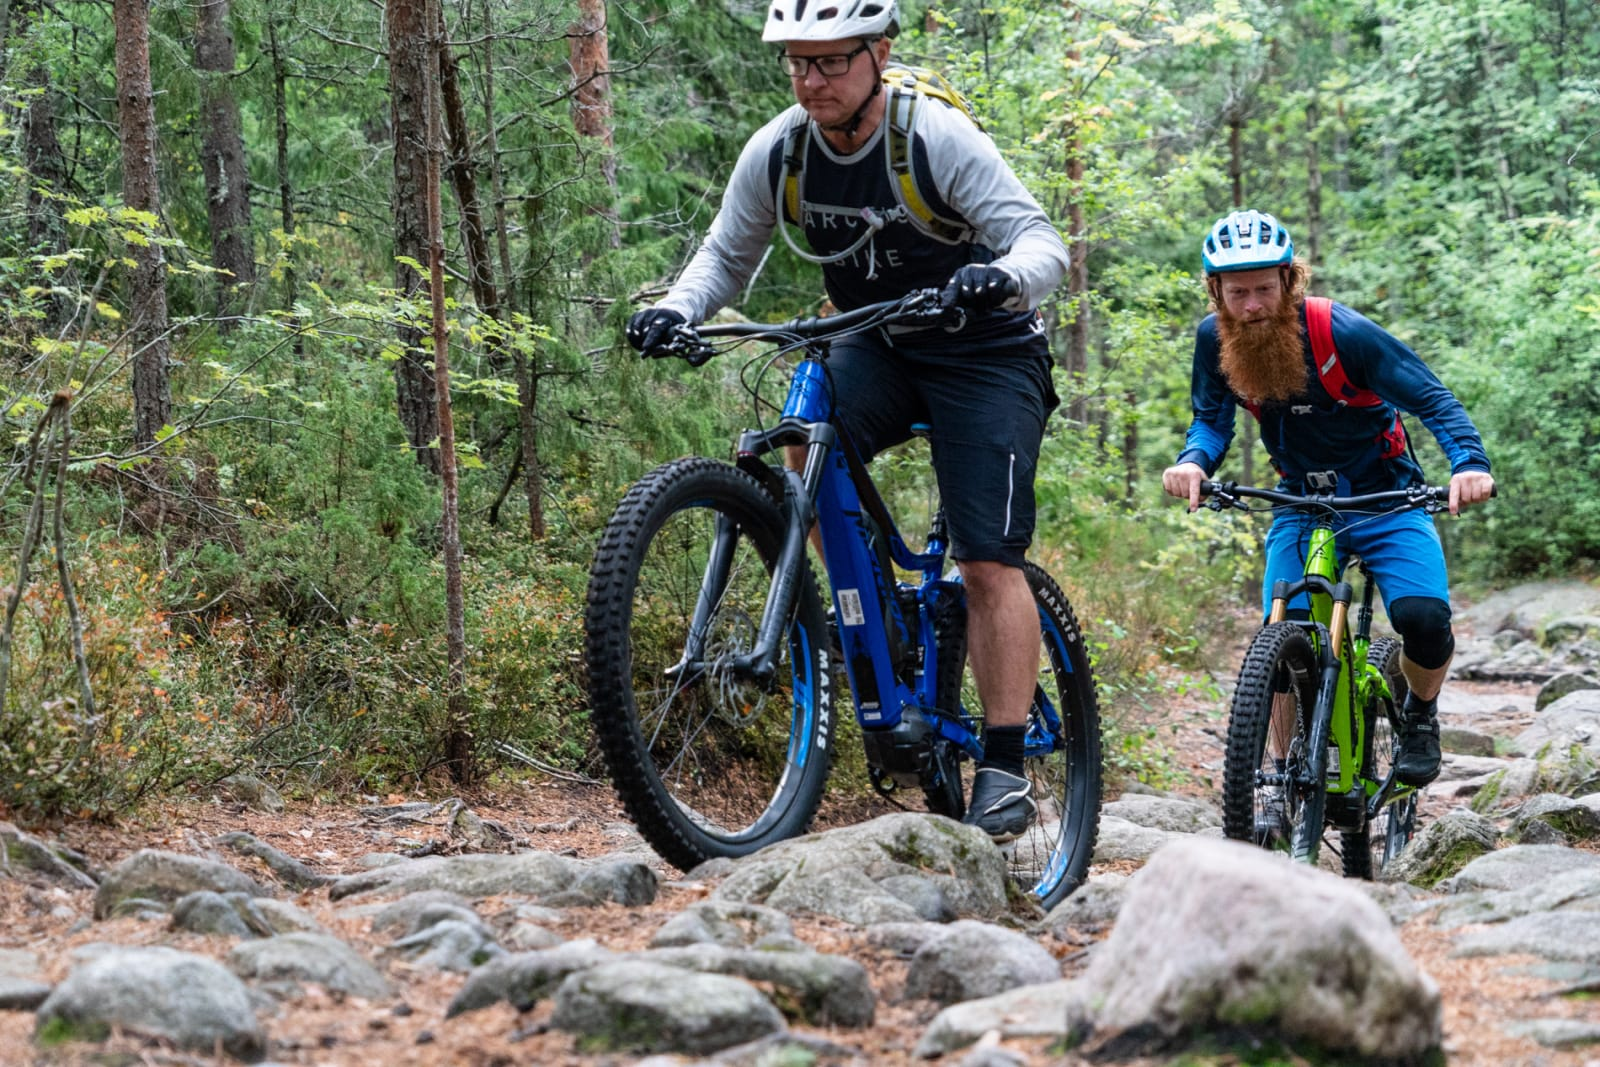 PÅ STRØM: Arild Andersen og Aslak Mørstad på el-sykkeltur. Bilde: Christian Nerdrum